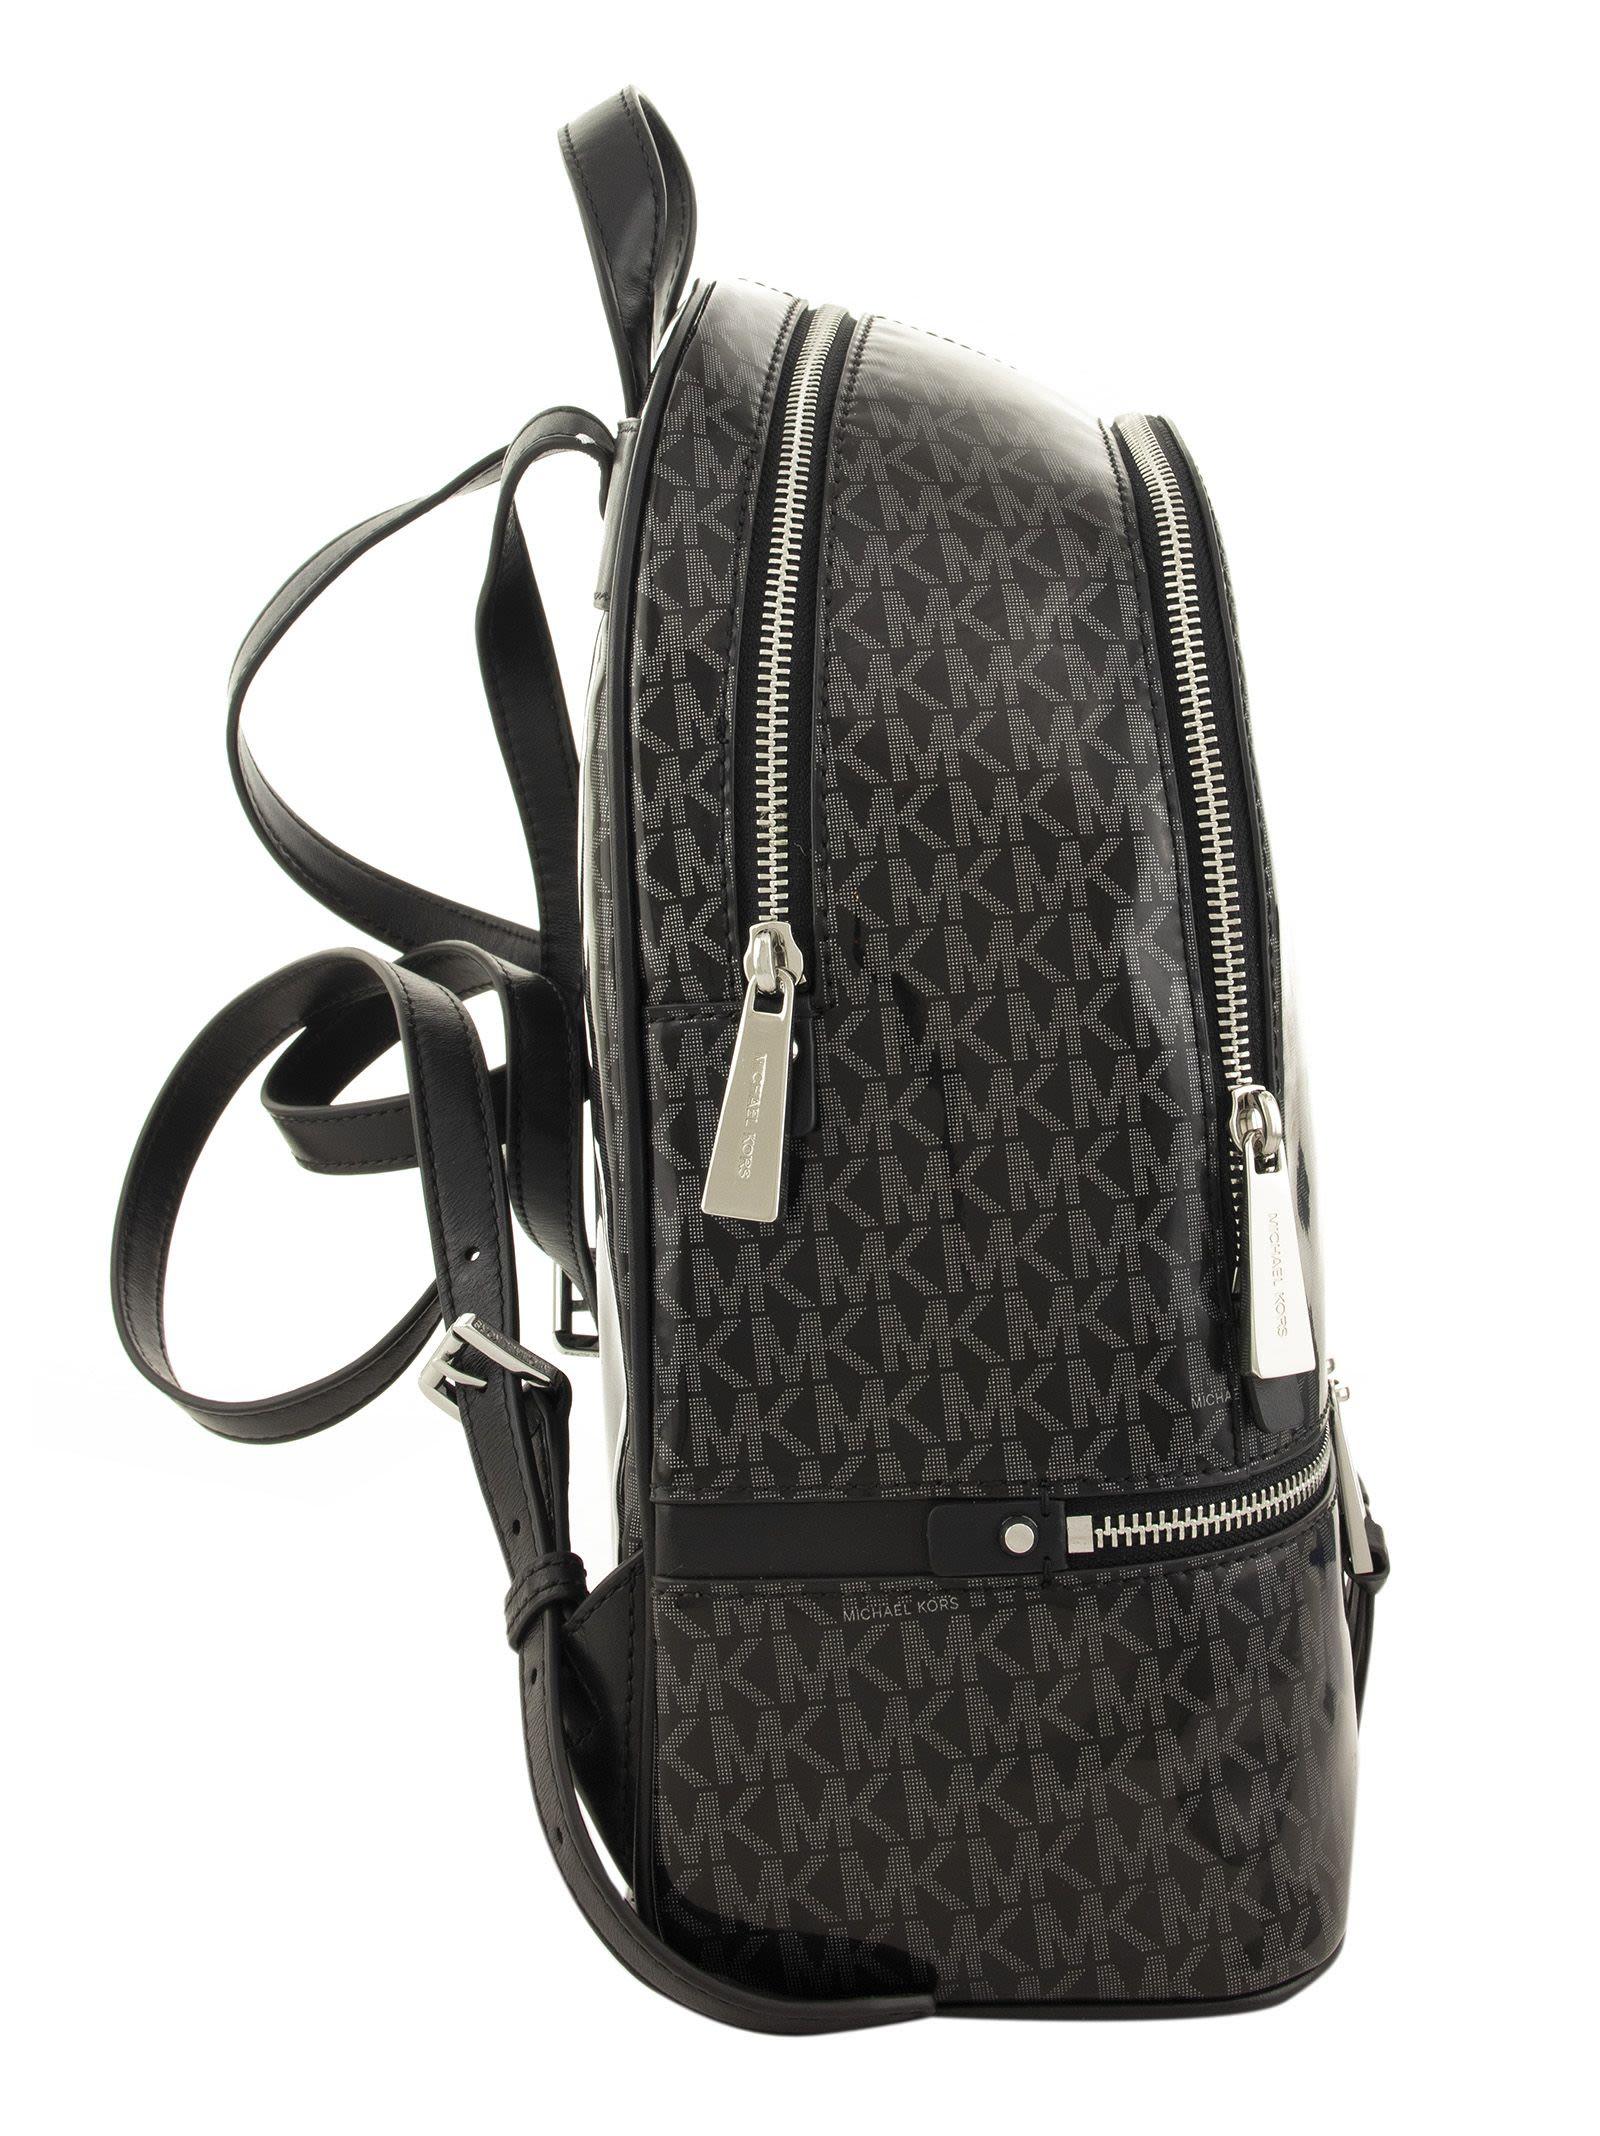 d31f1adb8d8b Michael Kors Michael Kors Monogram Backpack - BLACK - 10853852   italist